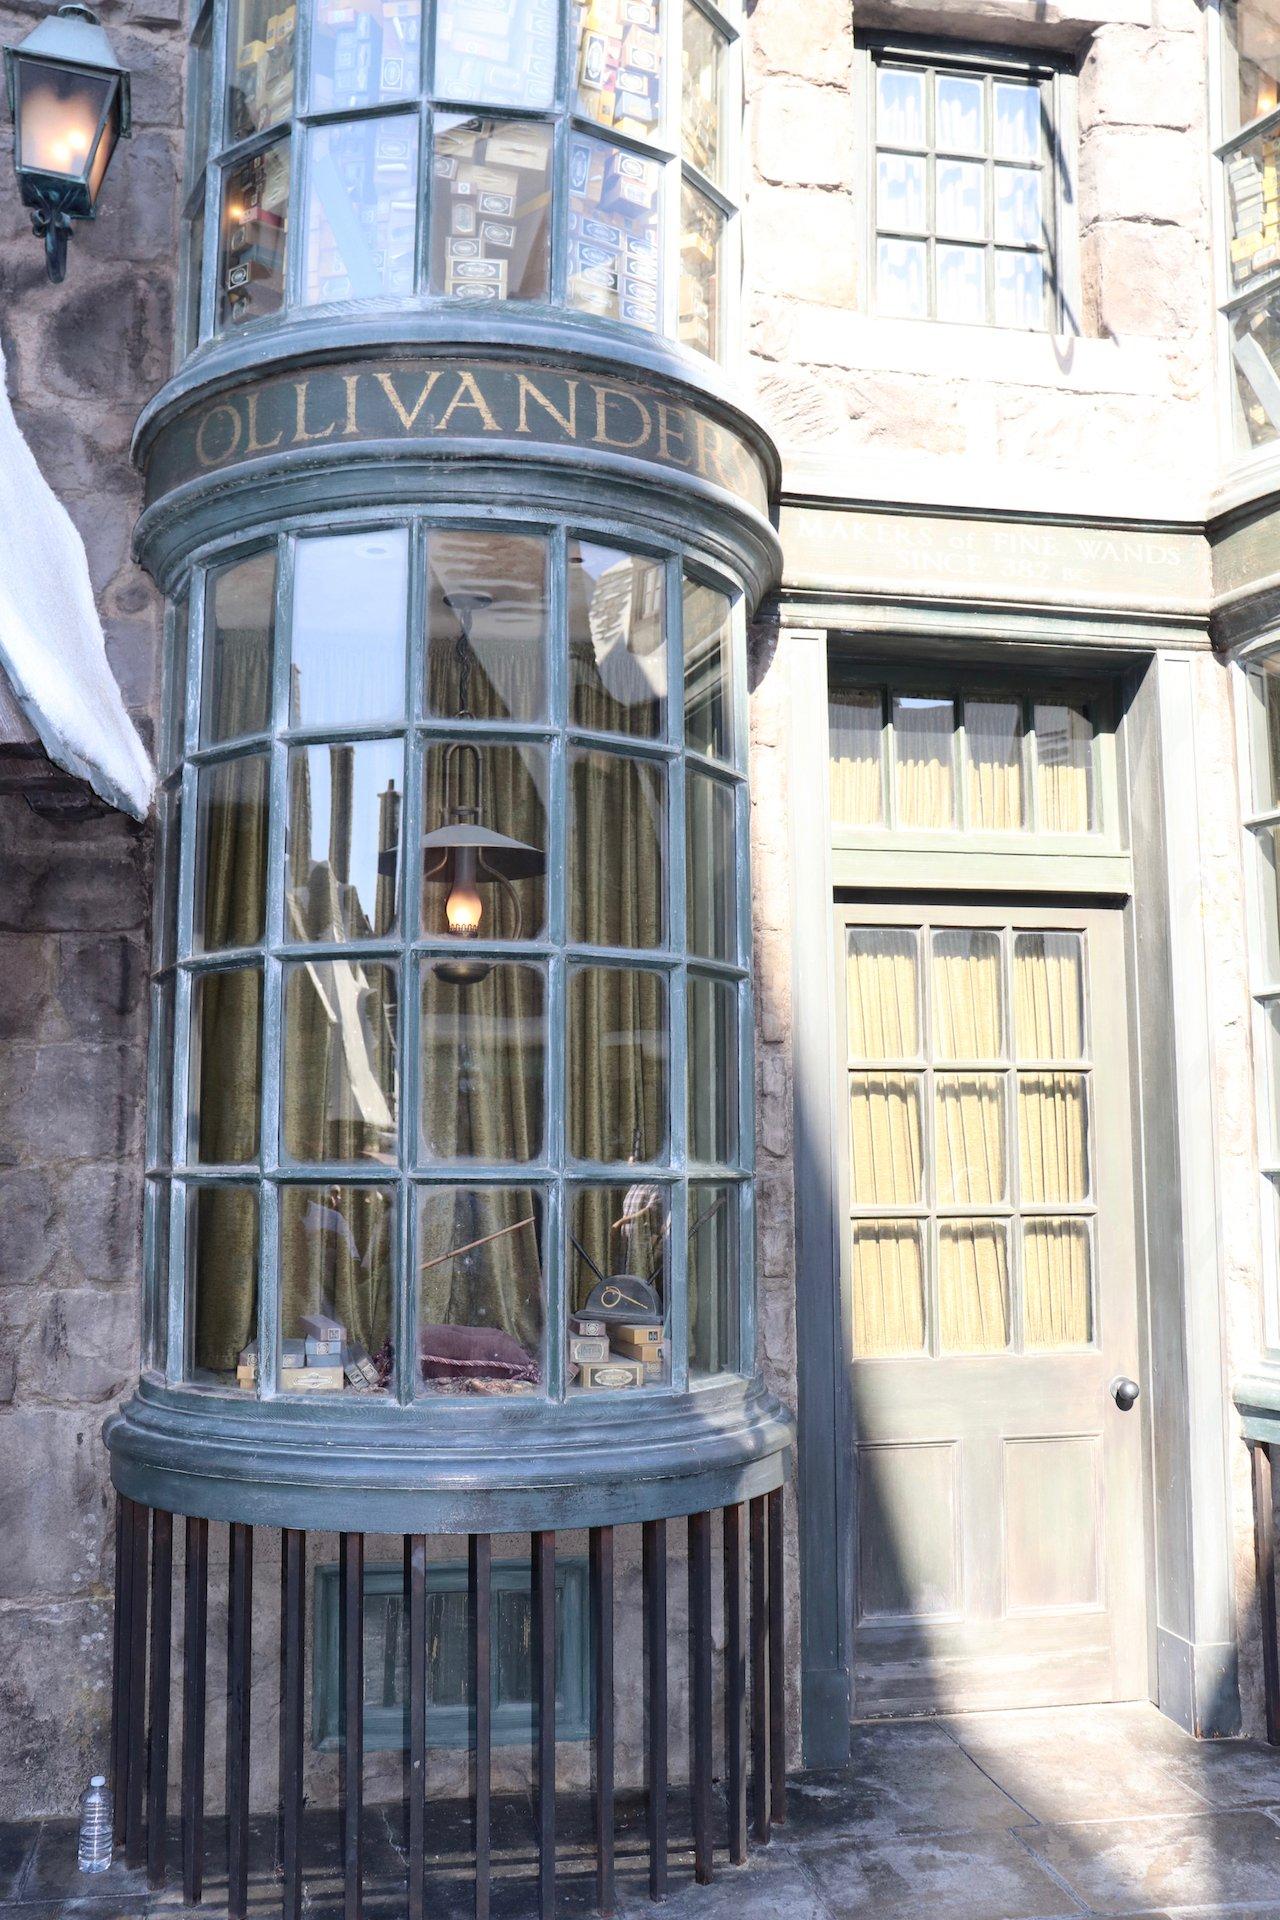 Universal Studios Hollywood Wizarding World Of Harry Potter Ollivander's